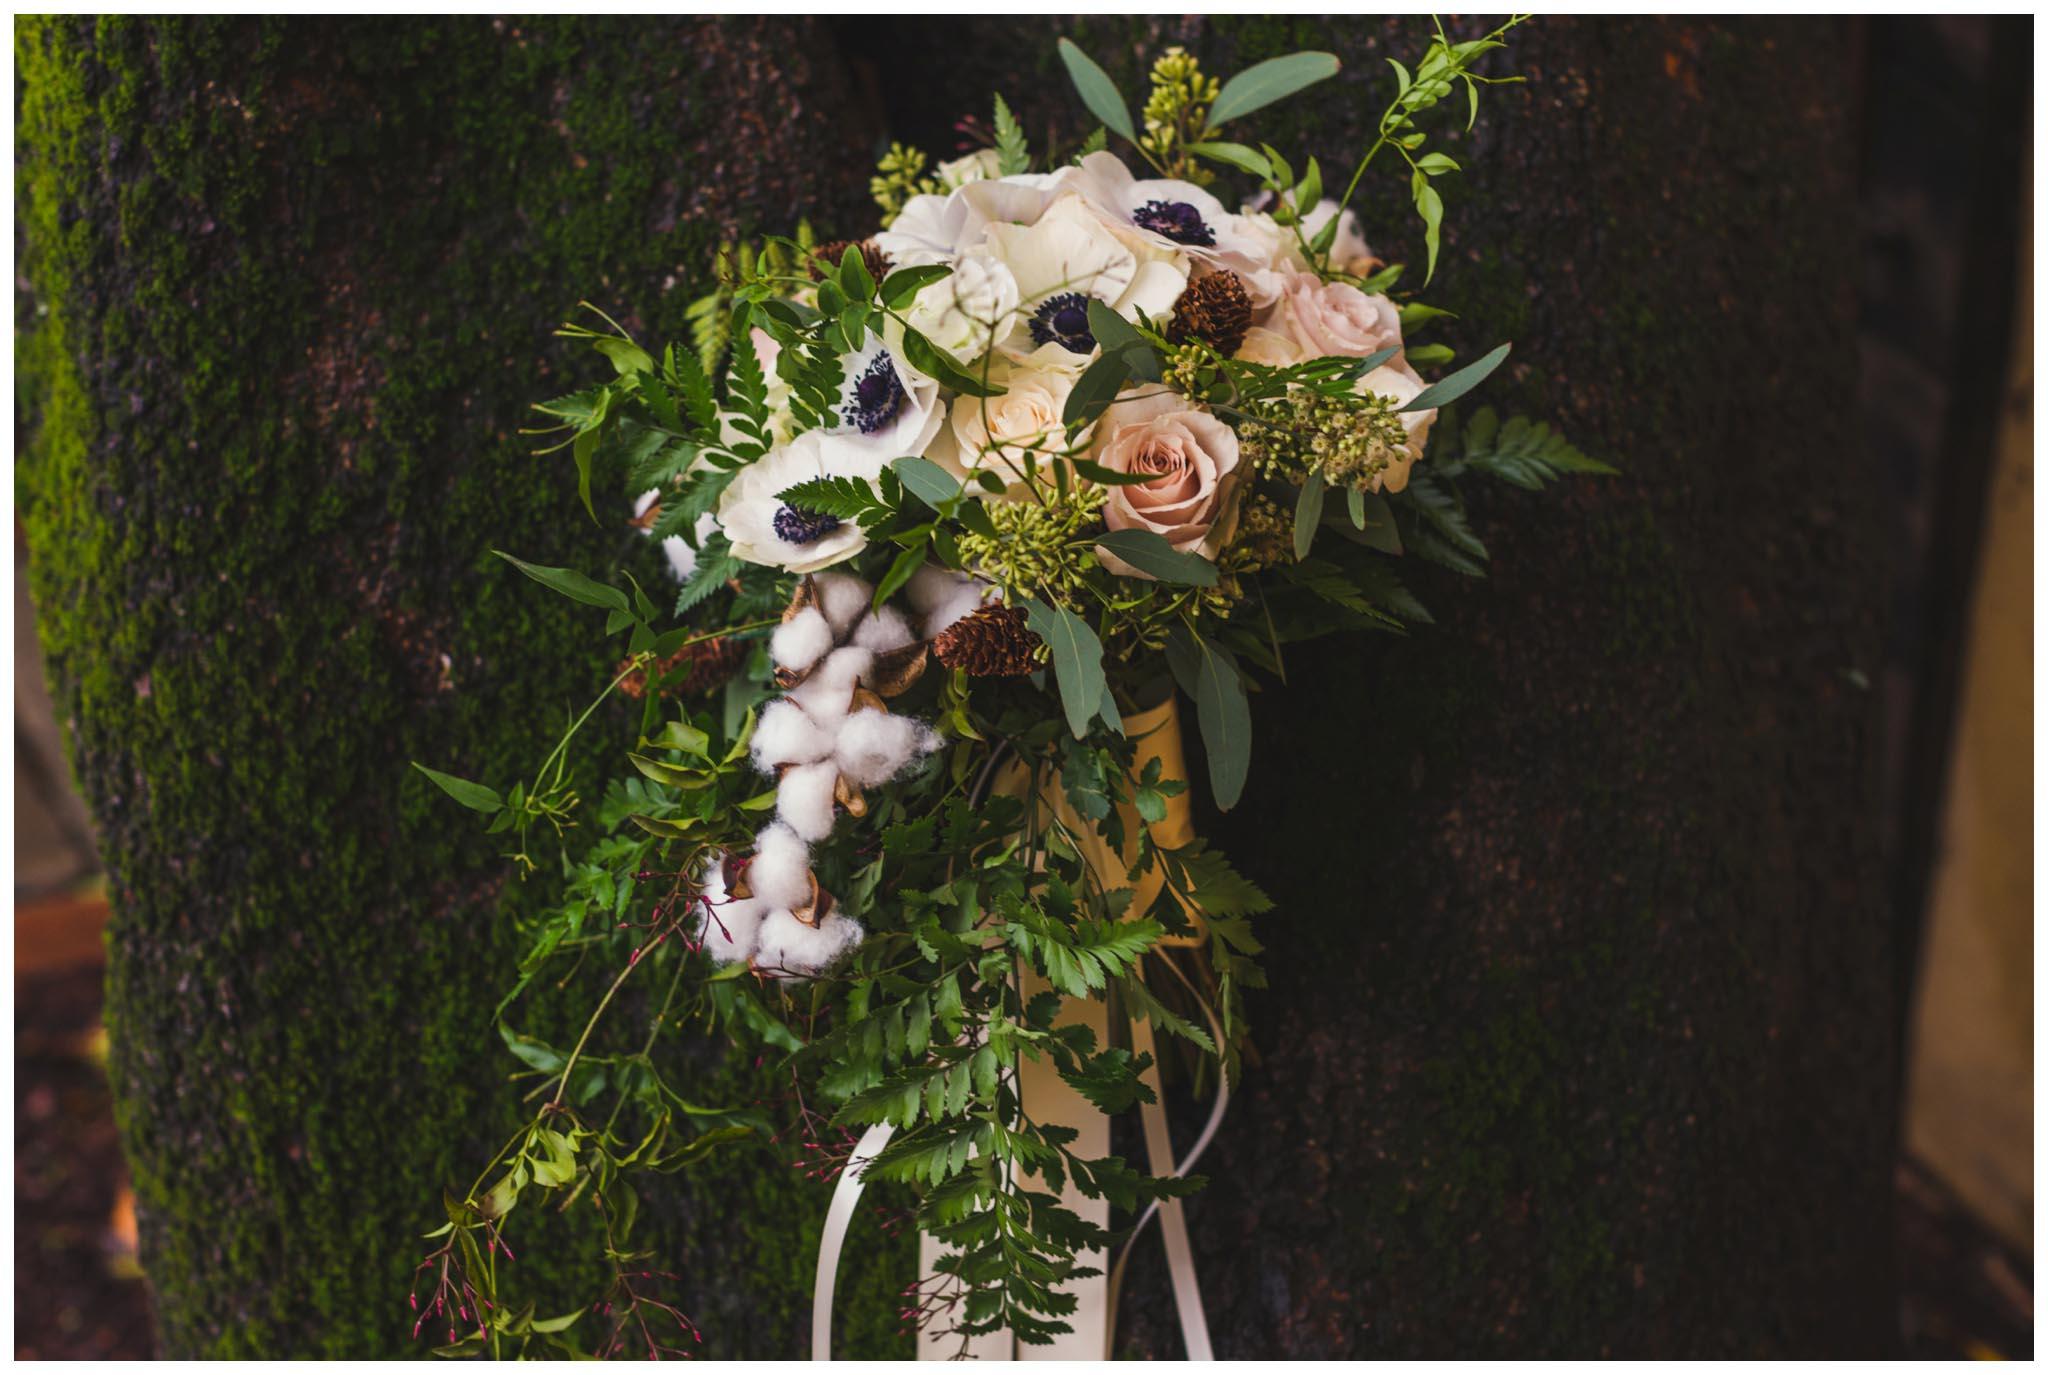 Cera Singley Events, bouquet, flowers